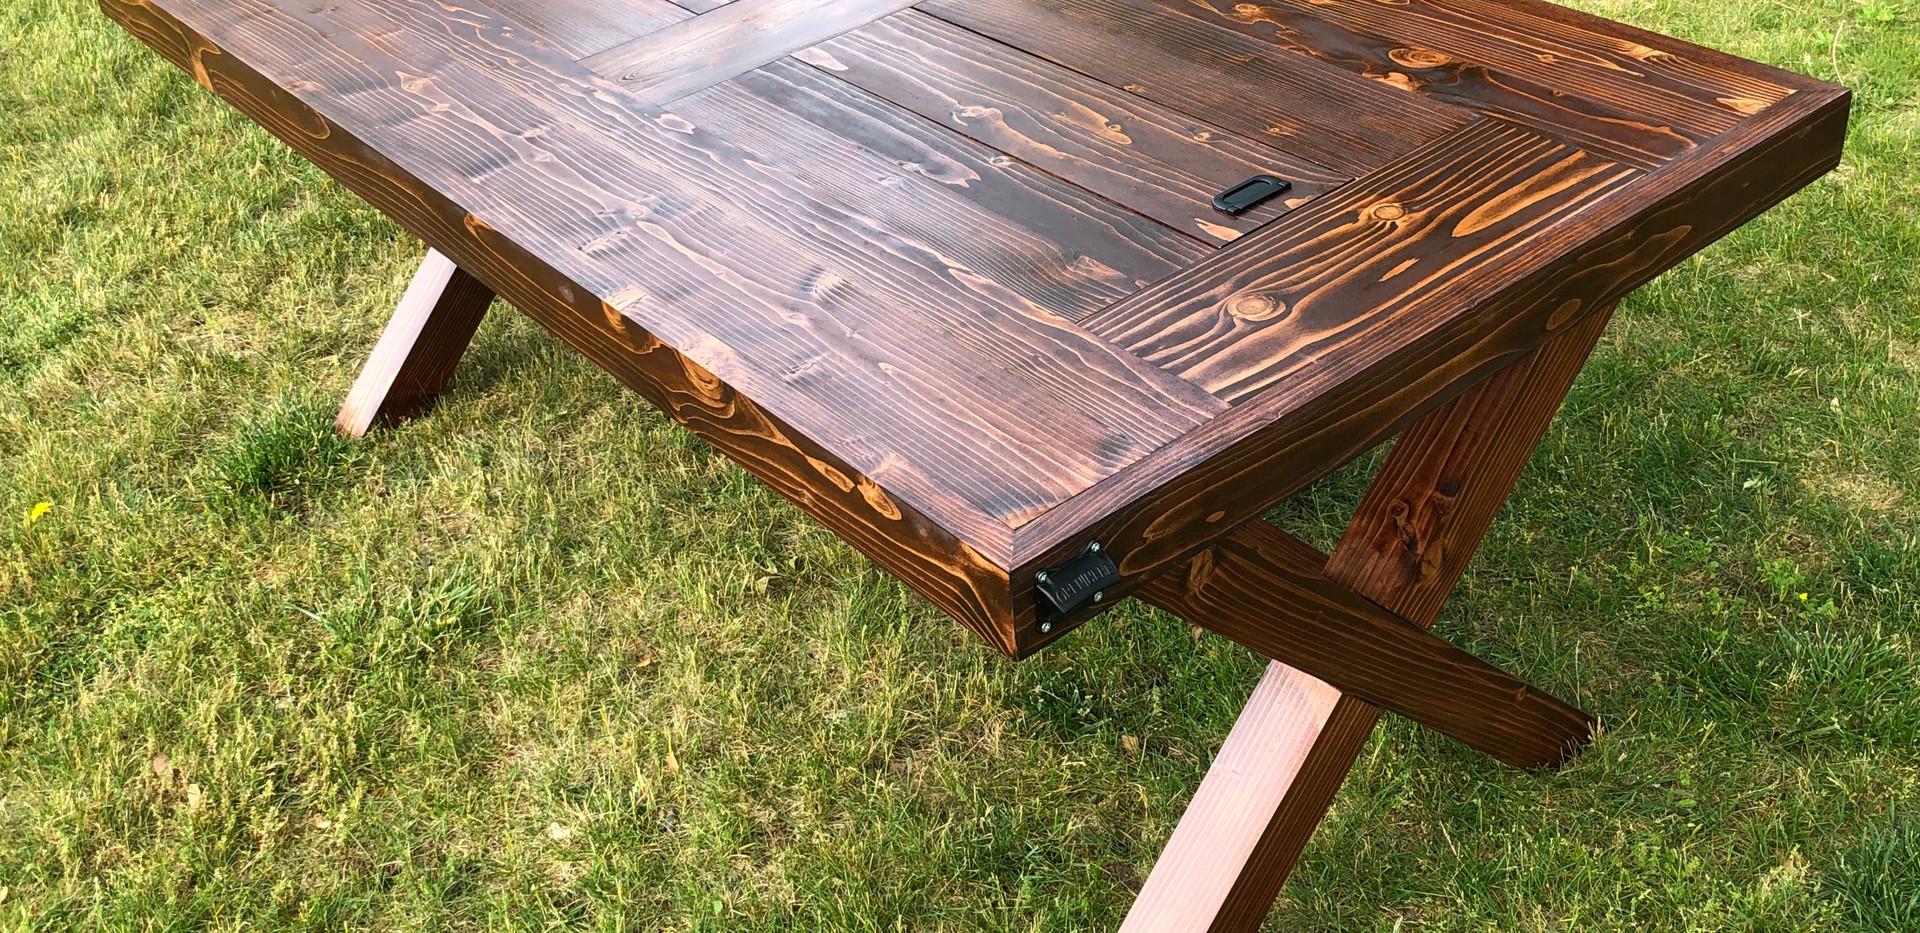 CASPIAN FARMHOUSE COOLER TABLE